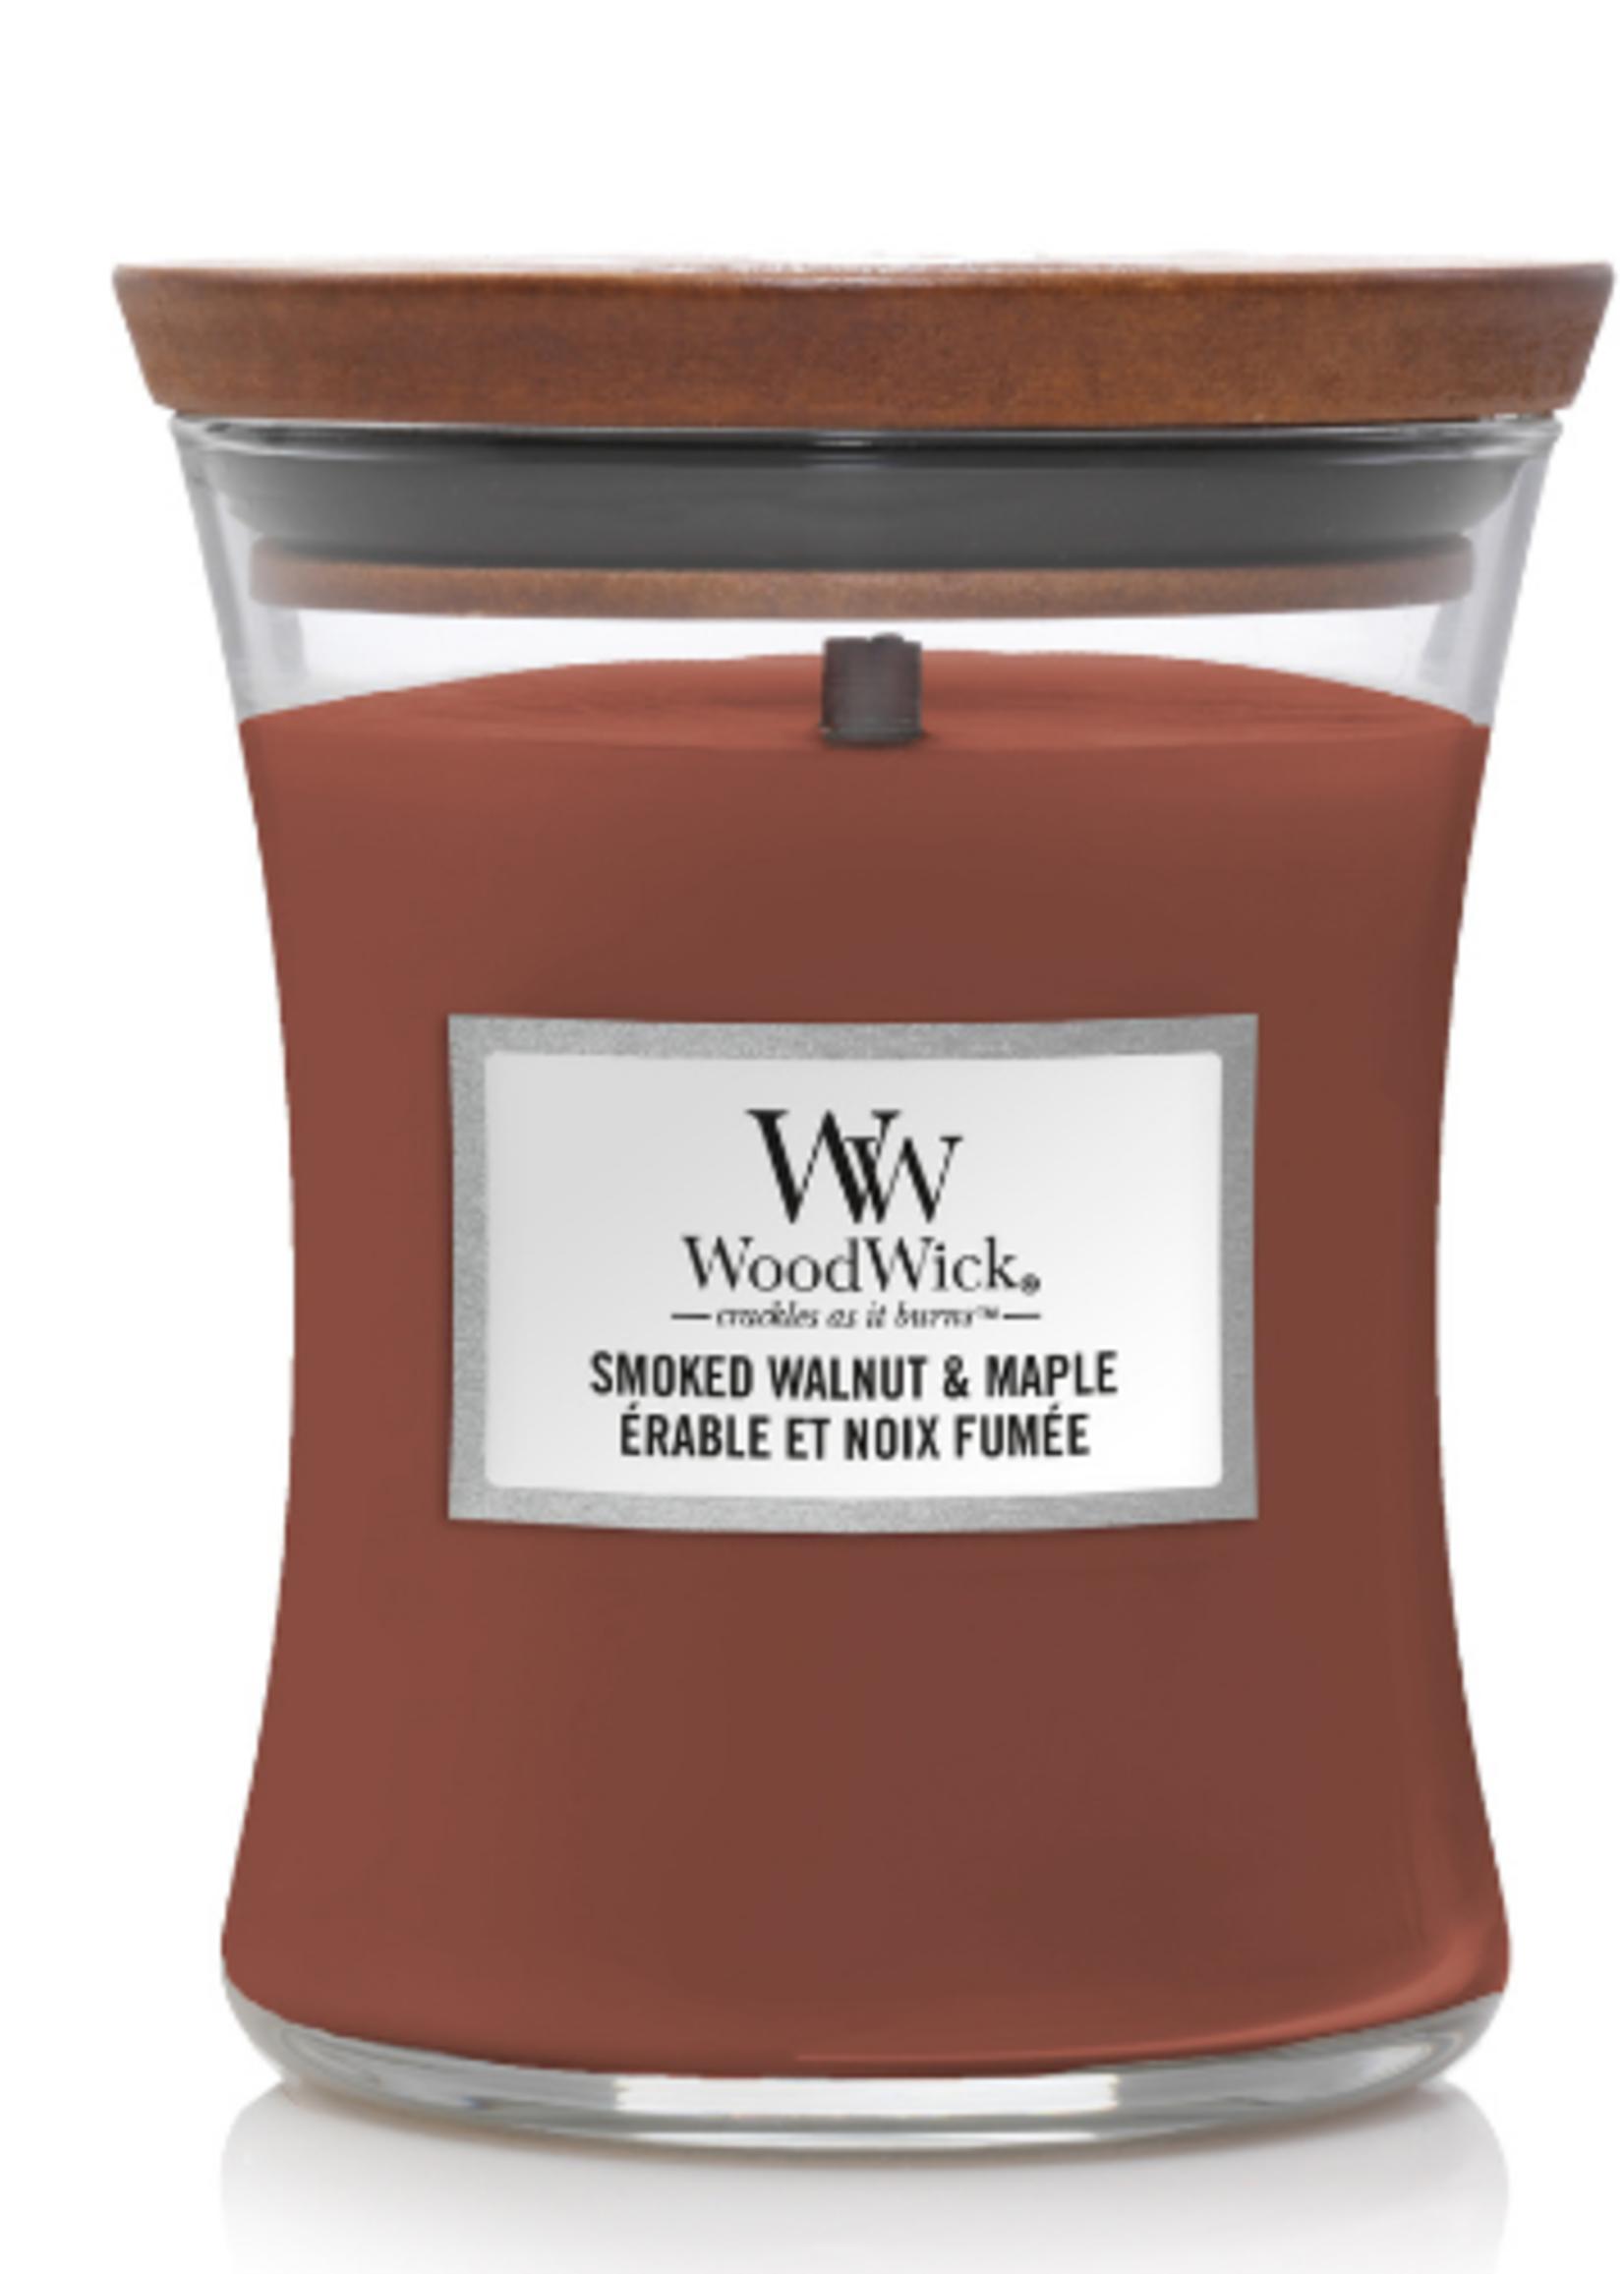 Smoked Walnut & Maple Medium